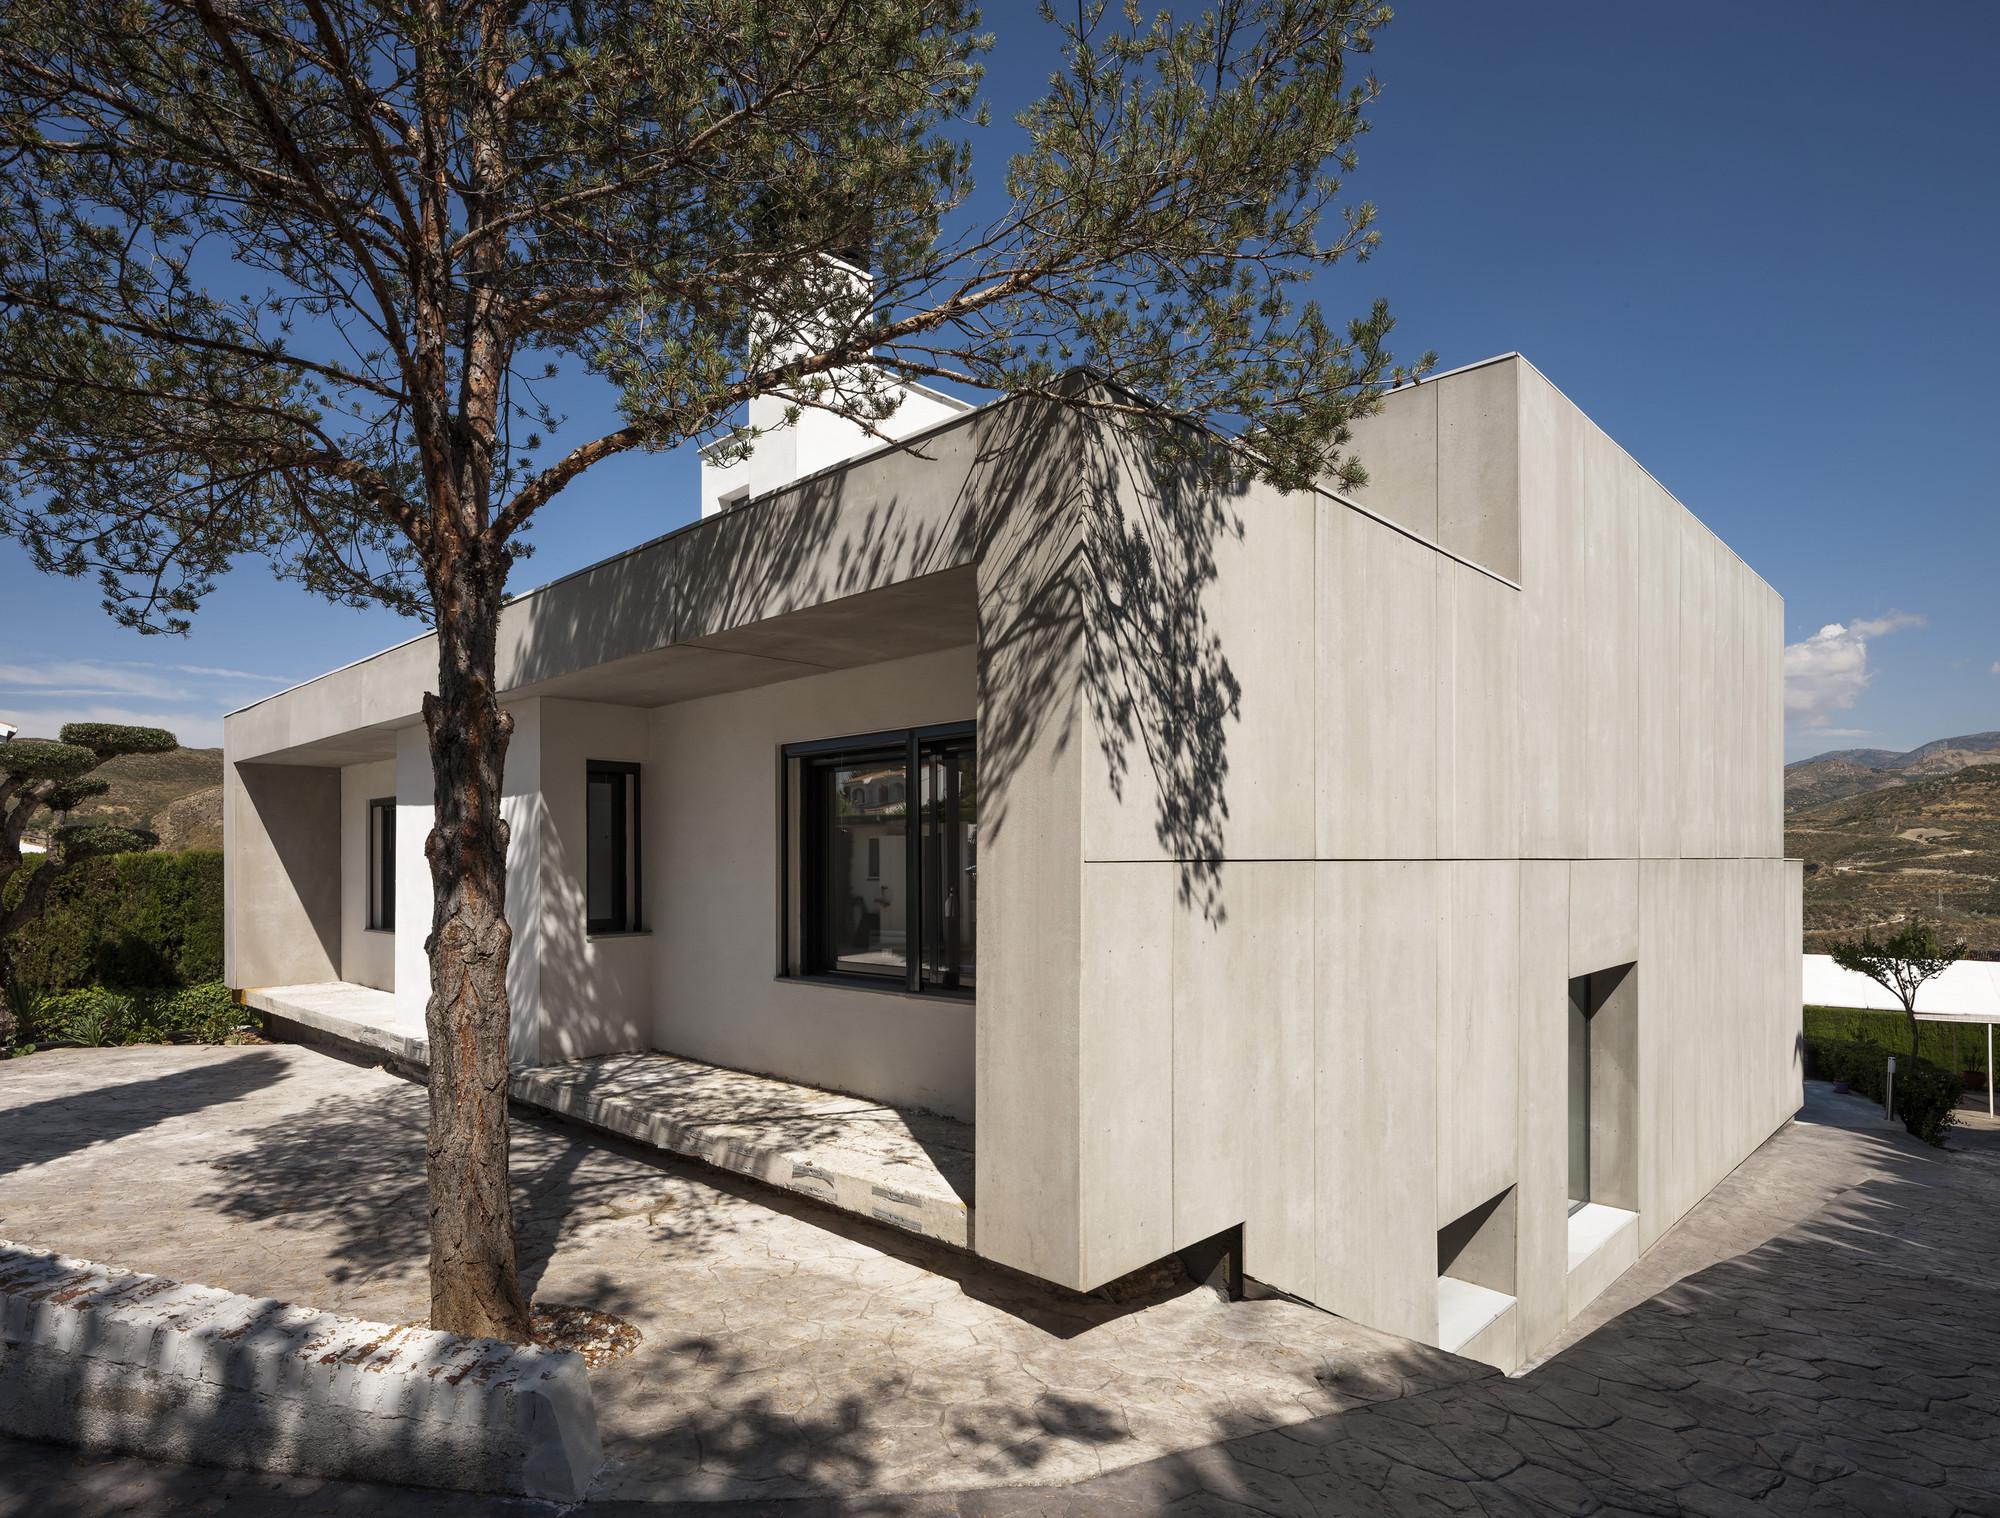 C&C House / Arias Recalde Taller de arquitectura, © Fernando Alda